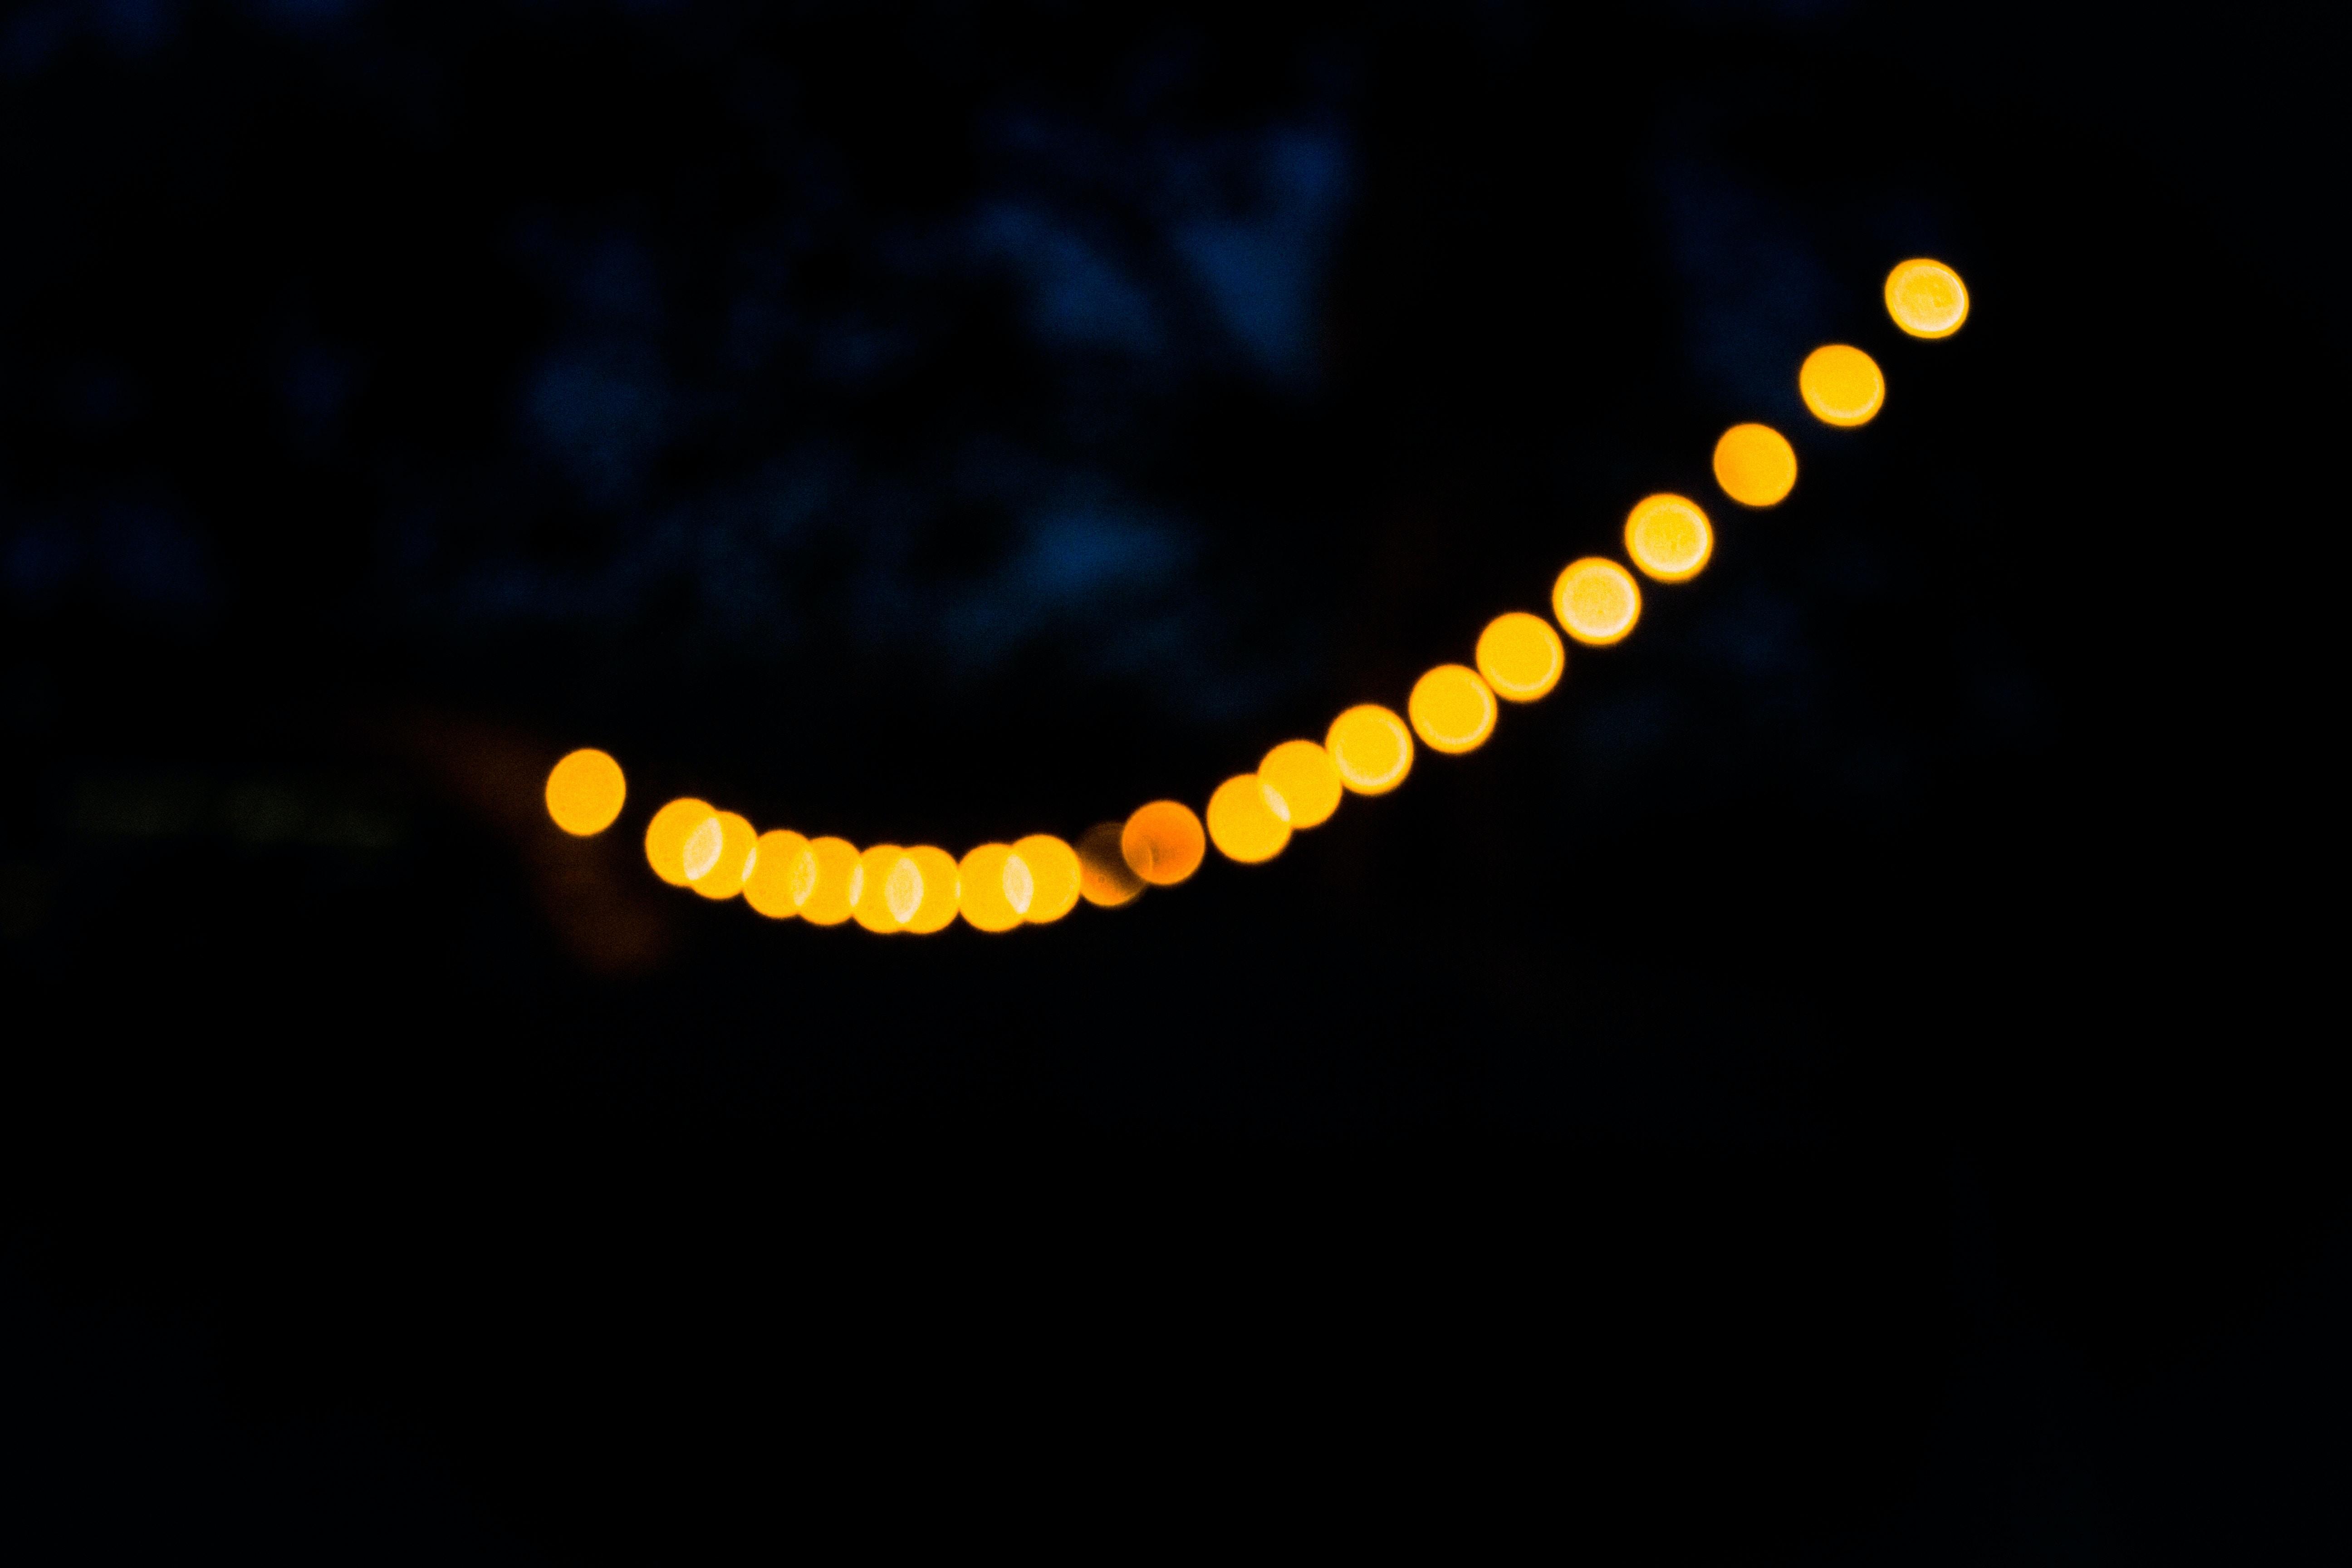 yellow bokeh light photography